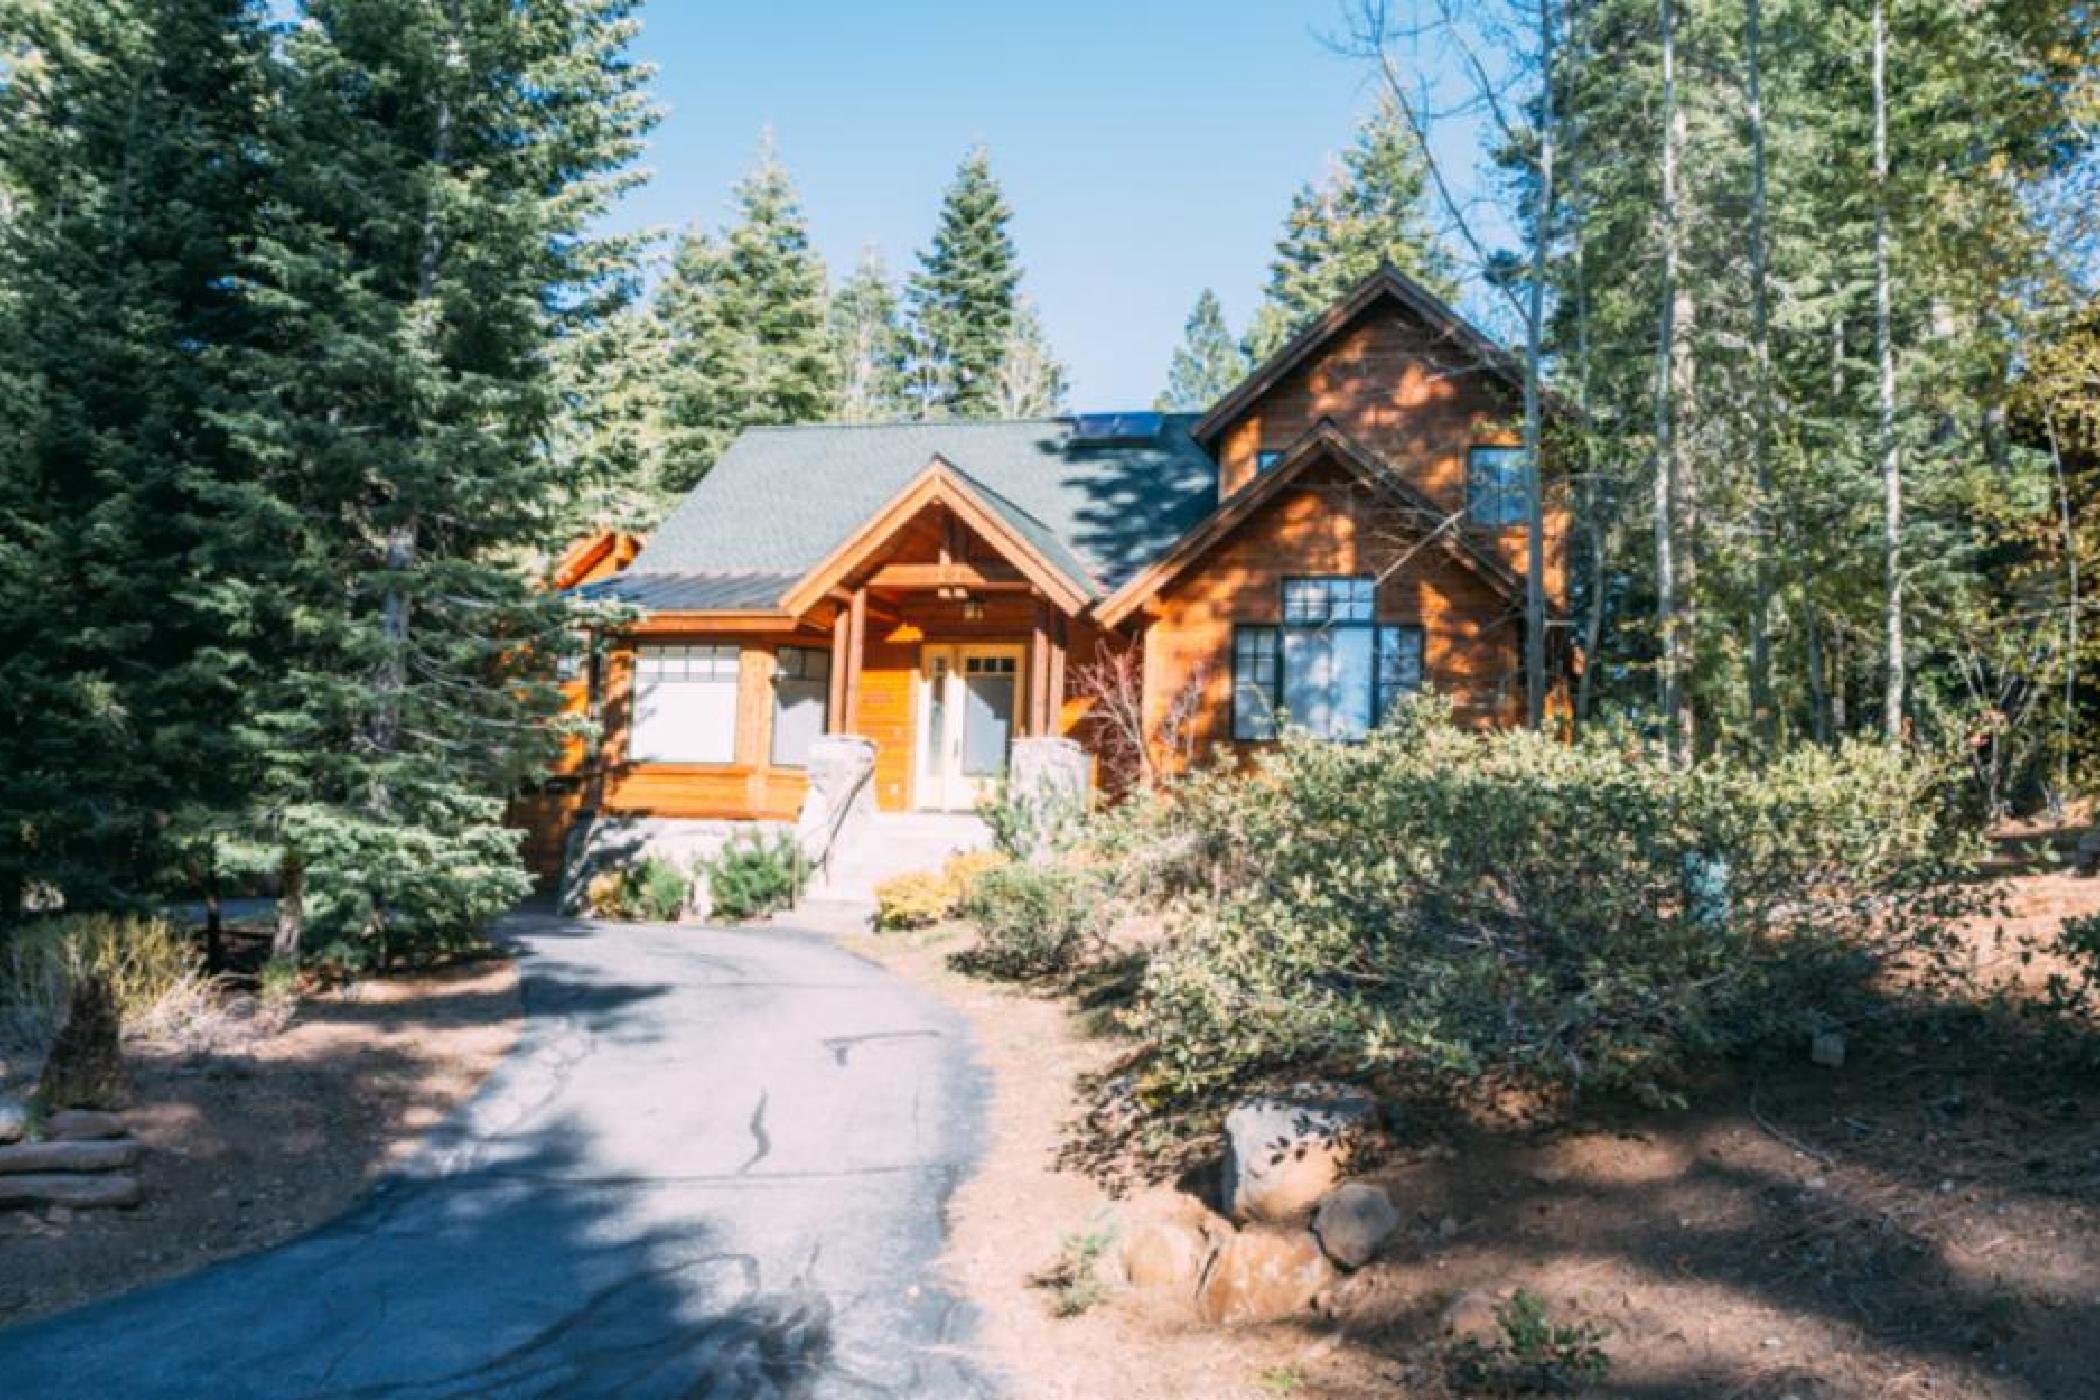 Custom-built luxury home in upscale Big Springs neighborhood with clubhouse amenities